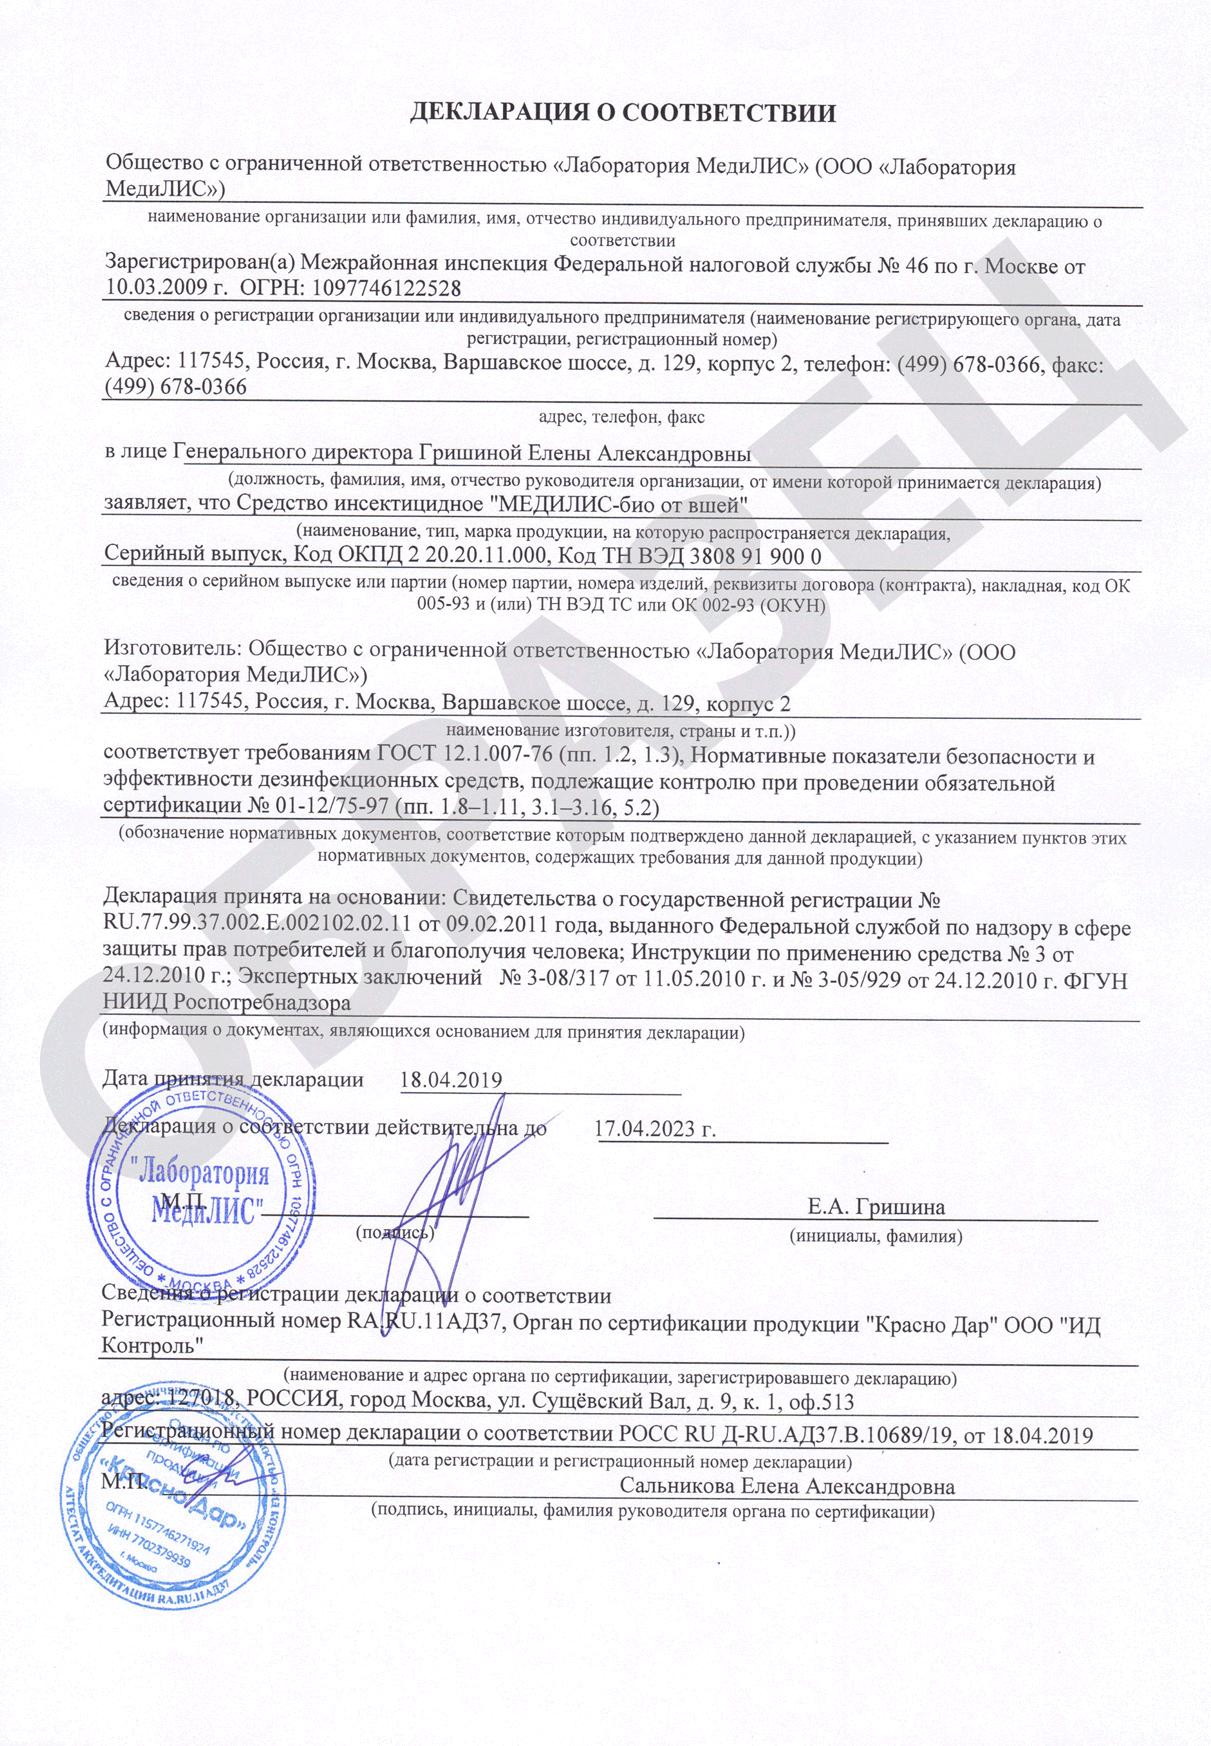 sertifikat_medilis_bio.png (802 KB)